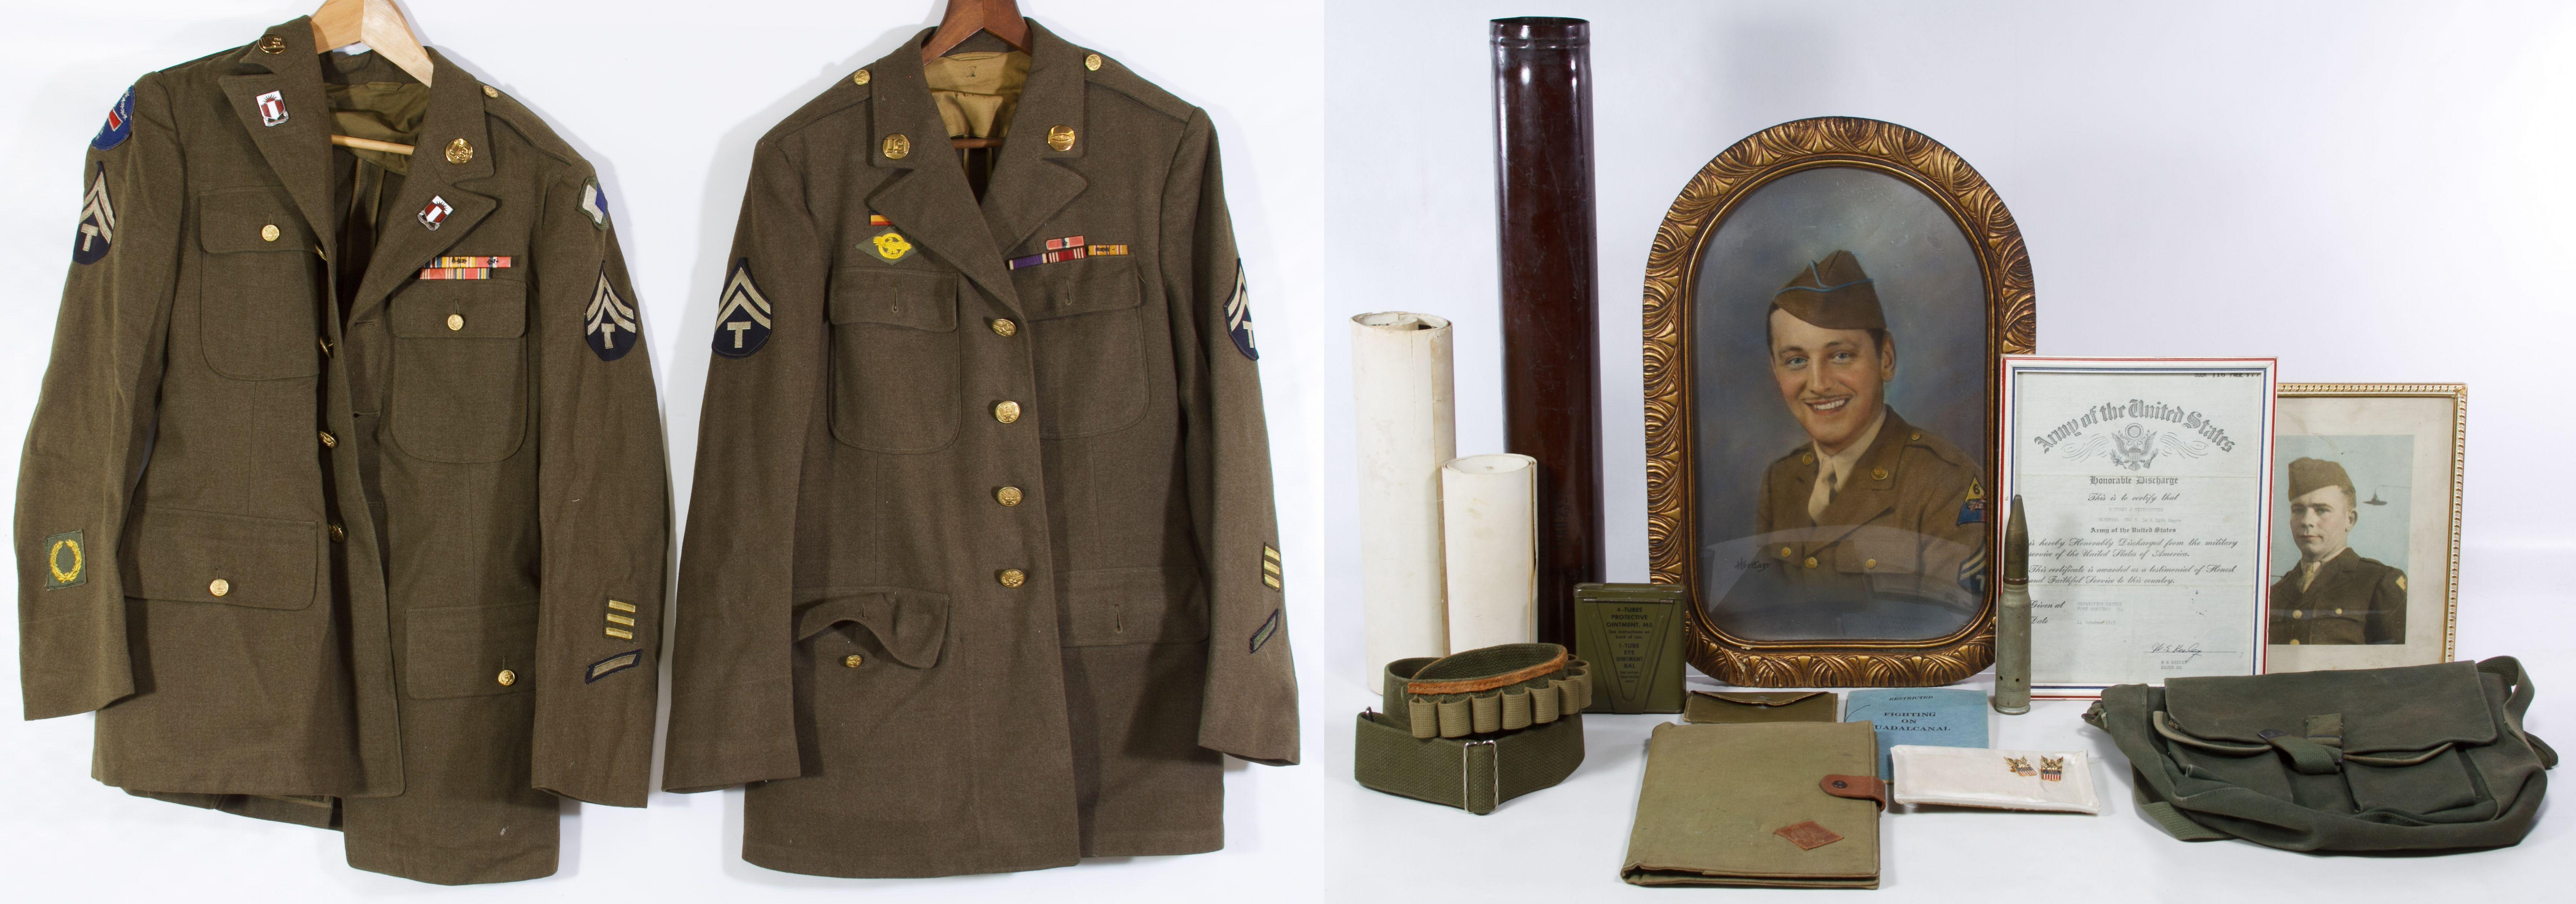 Lot 465  World War II US Army Jacket a3225daf0da